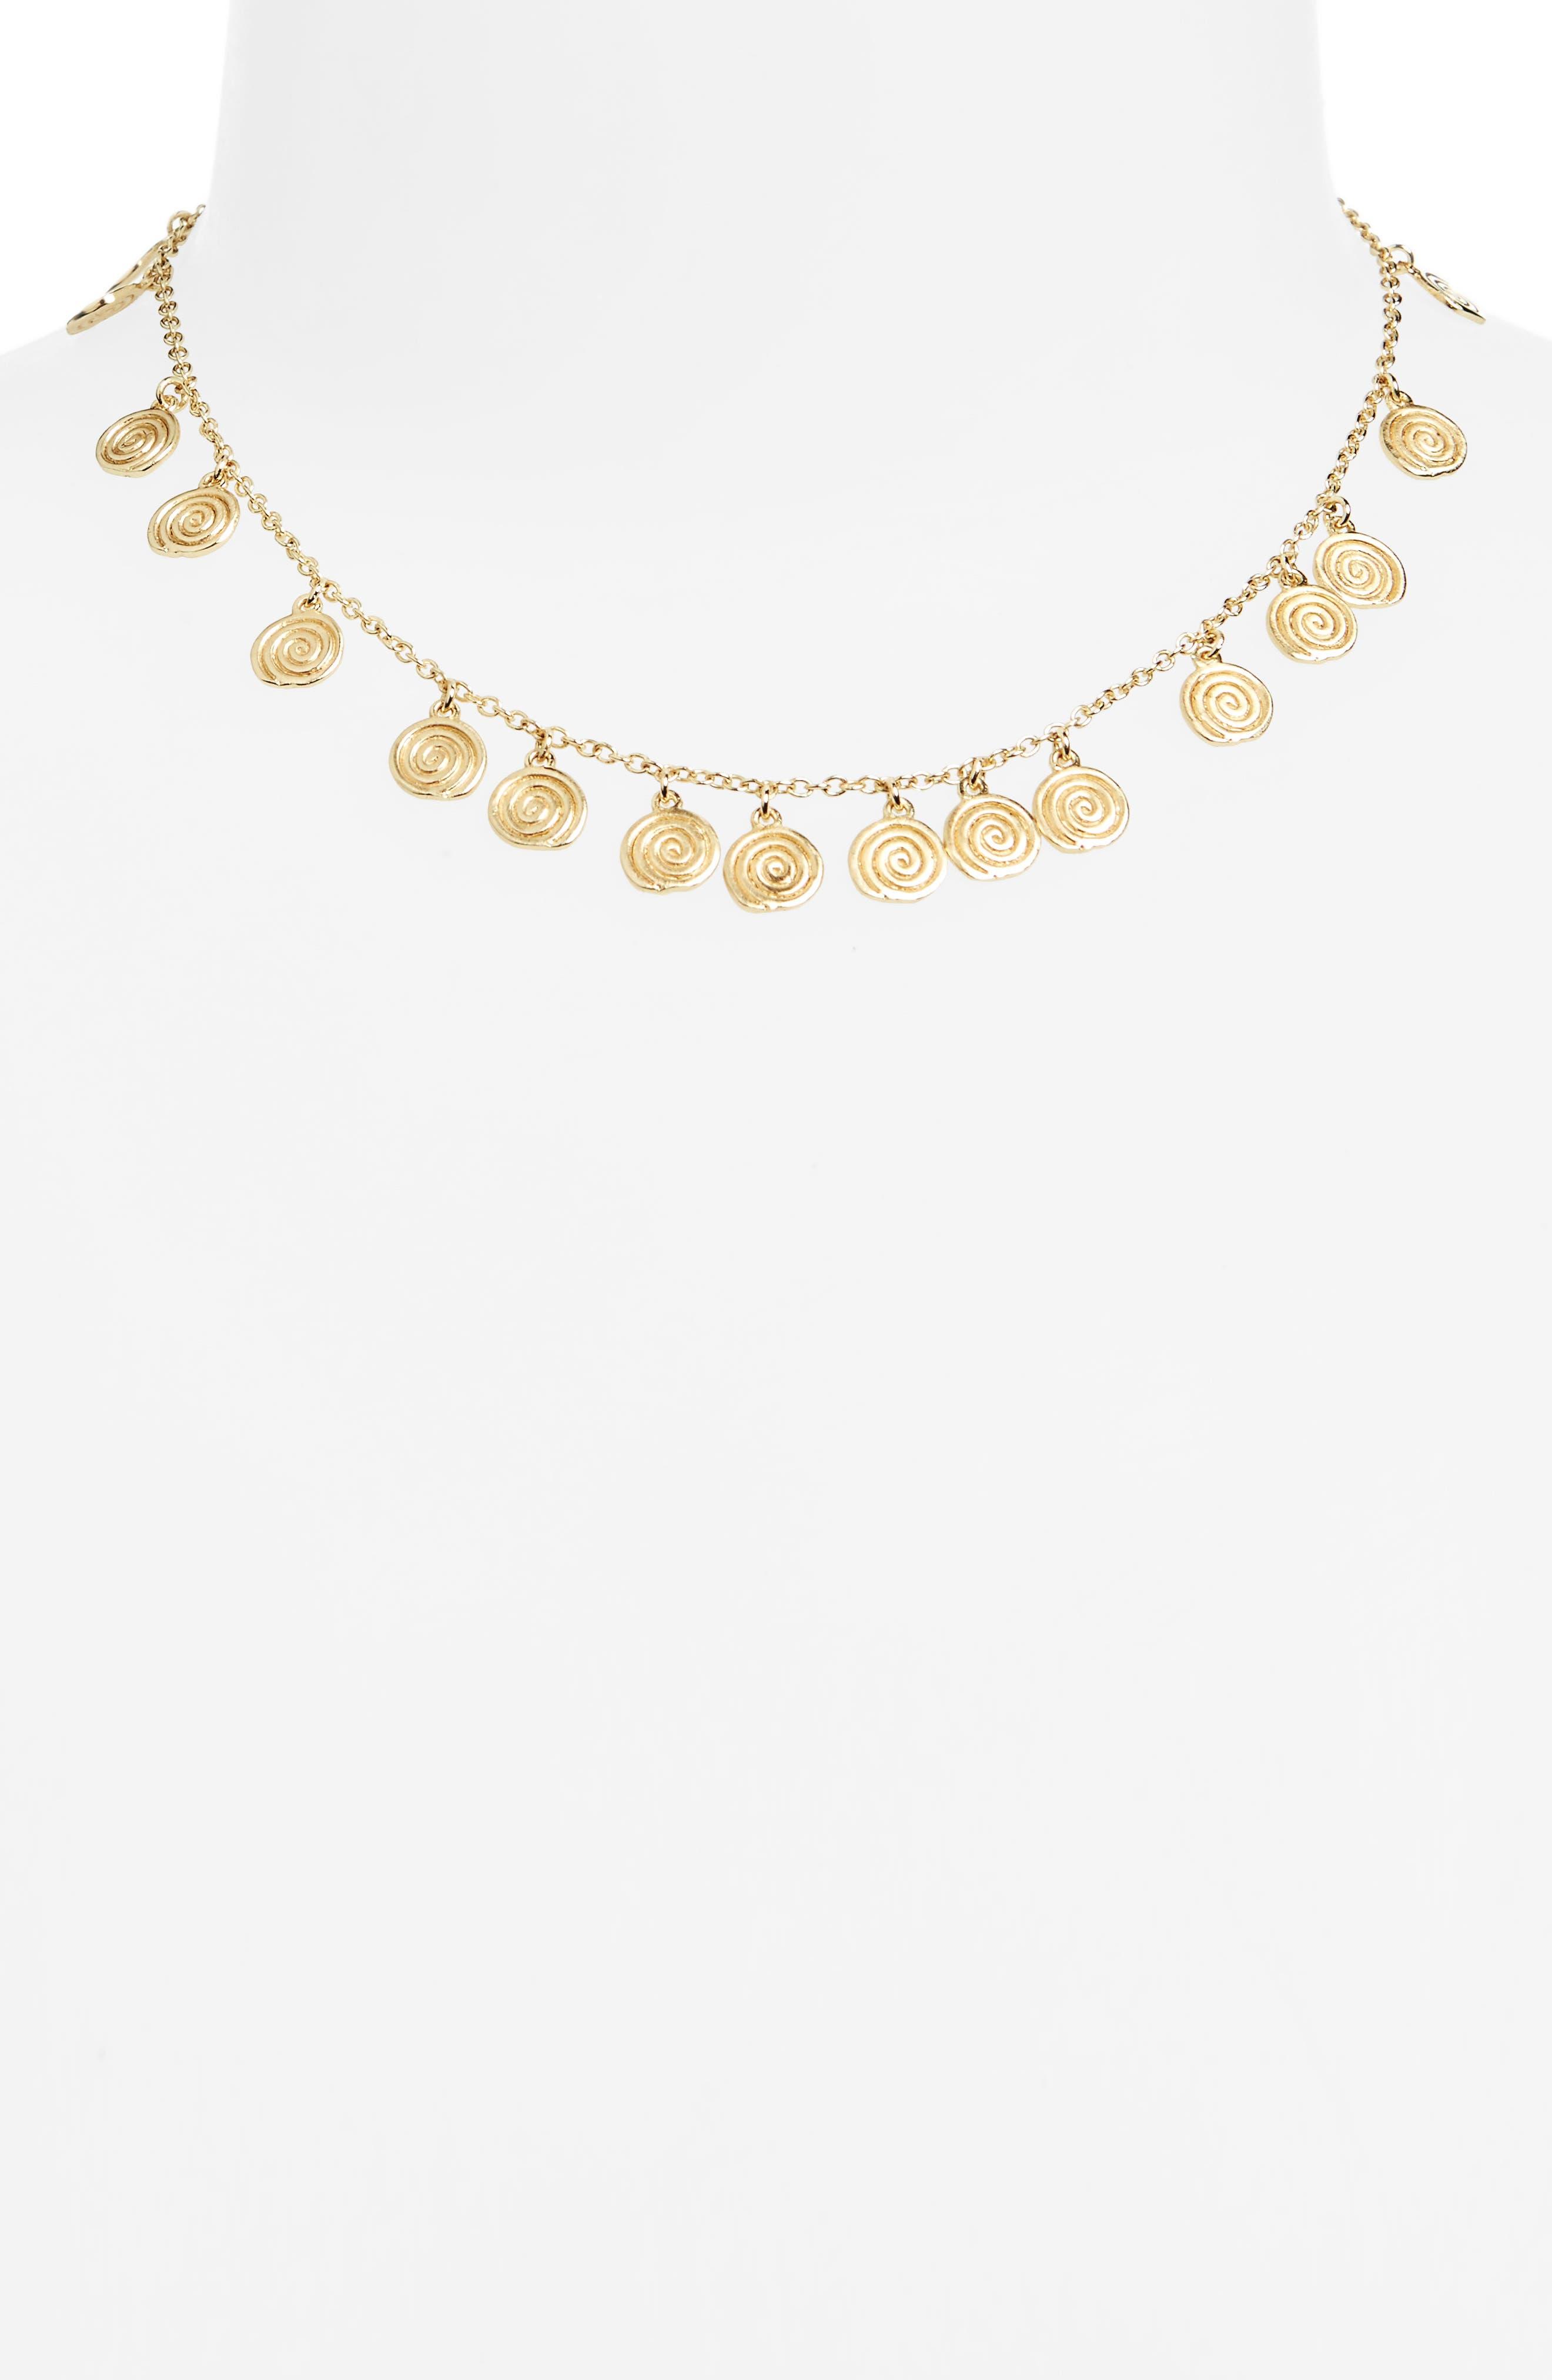 Sullivan - Reeves Charm Necklace,                             Main thumbnail 1, color,                             715